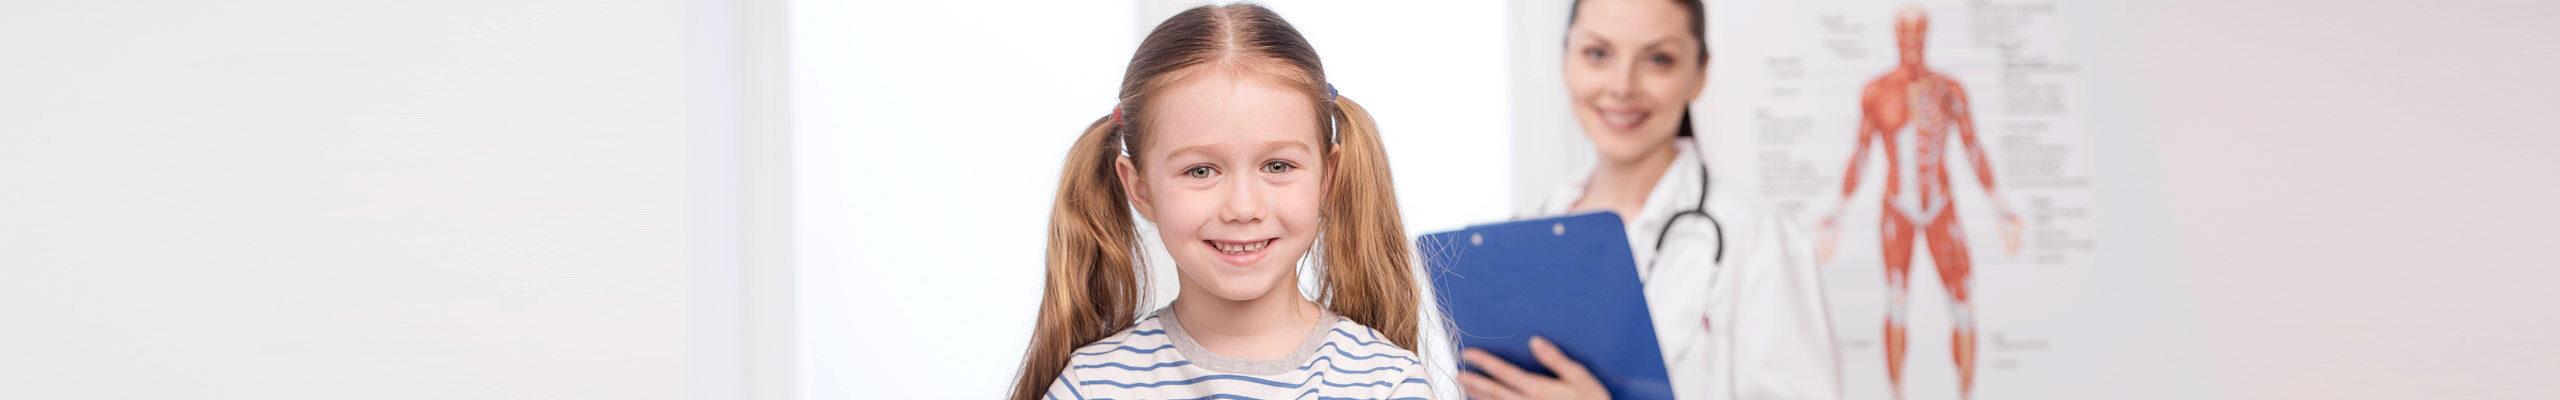 Pediatric clinical trials